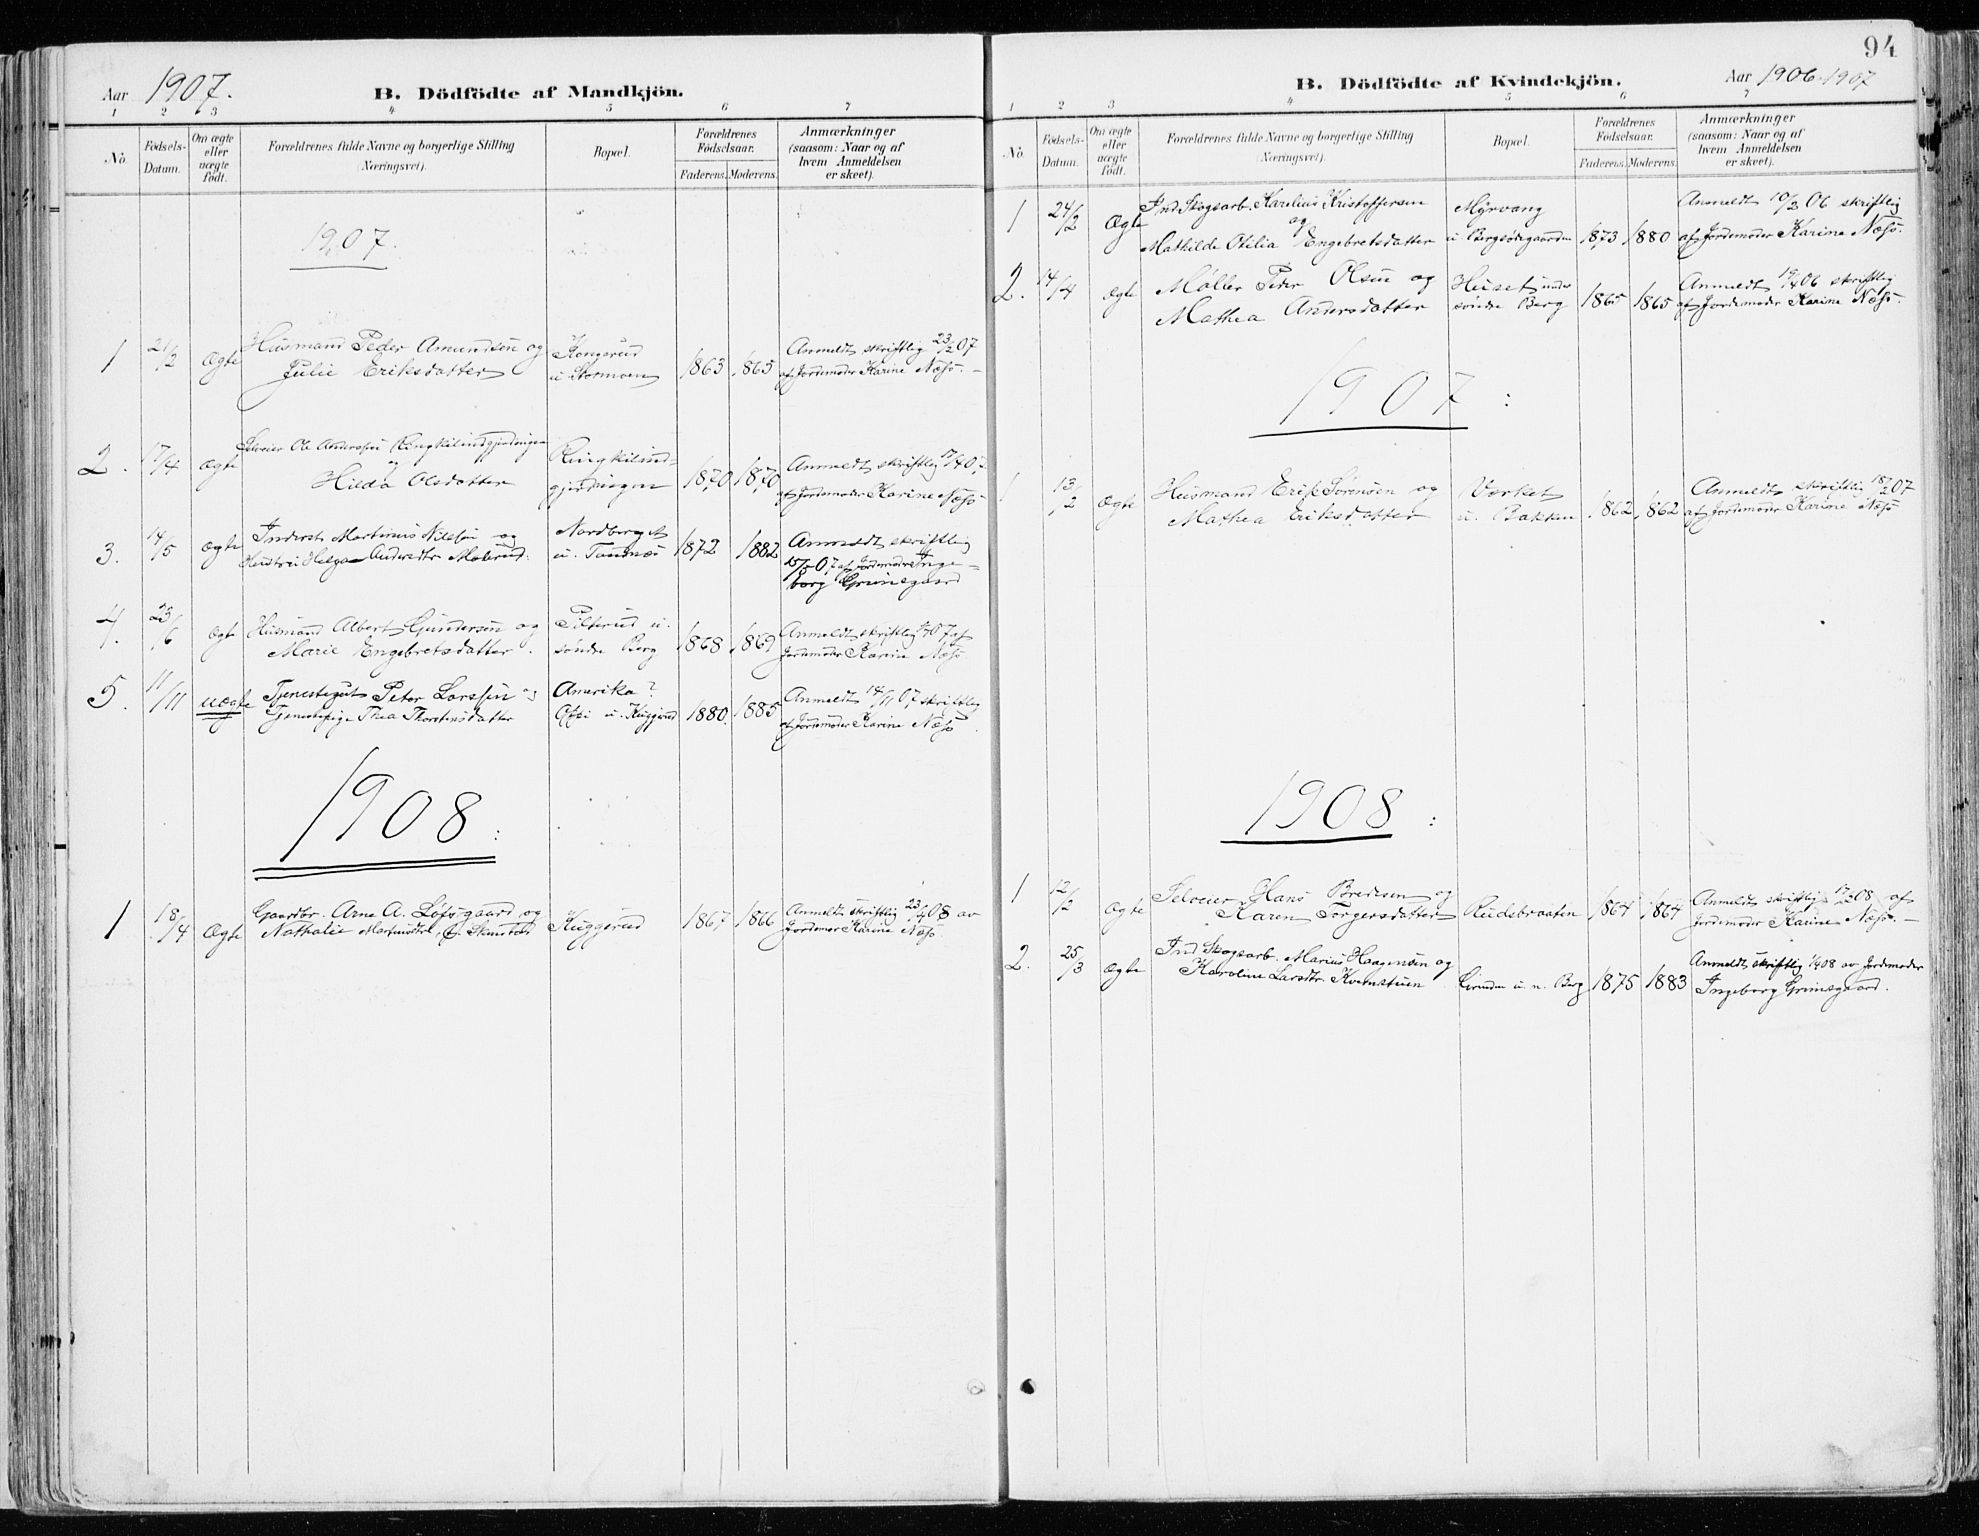 SAH, Nord-Odal prestekontor, Ministerialbok nr. 9, 1902-1926, s. 94